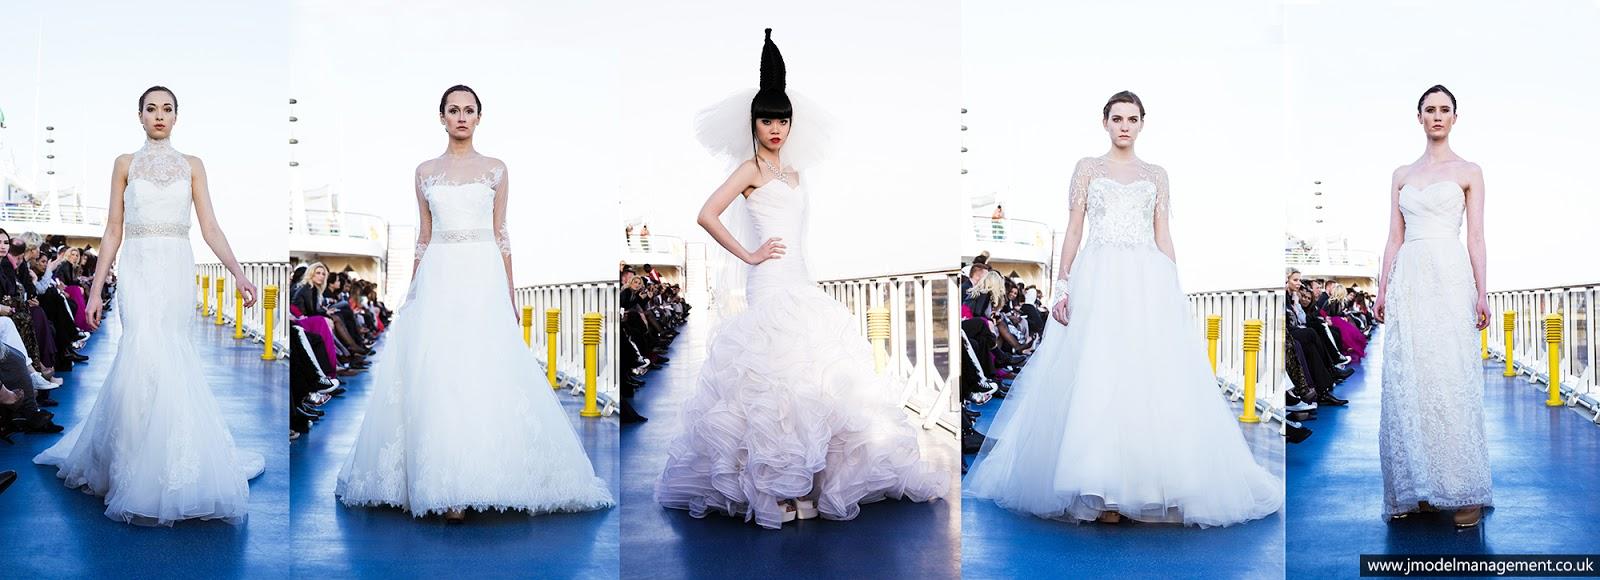 WTFSG-j-winter-fashion-show-on-costa-atlantica-Frost-Boutique